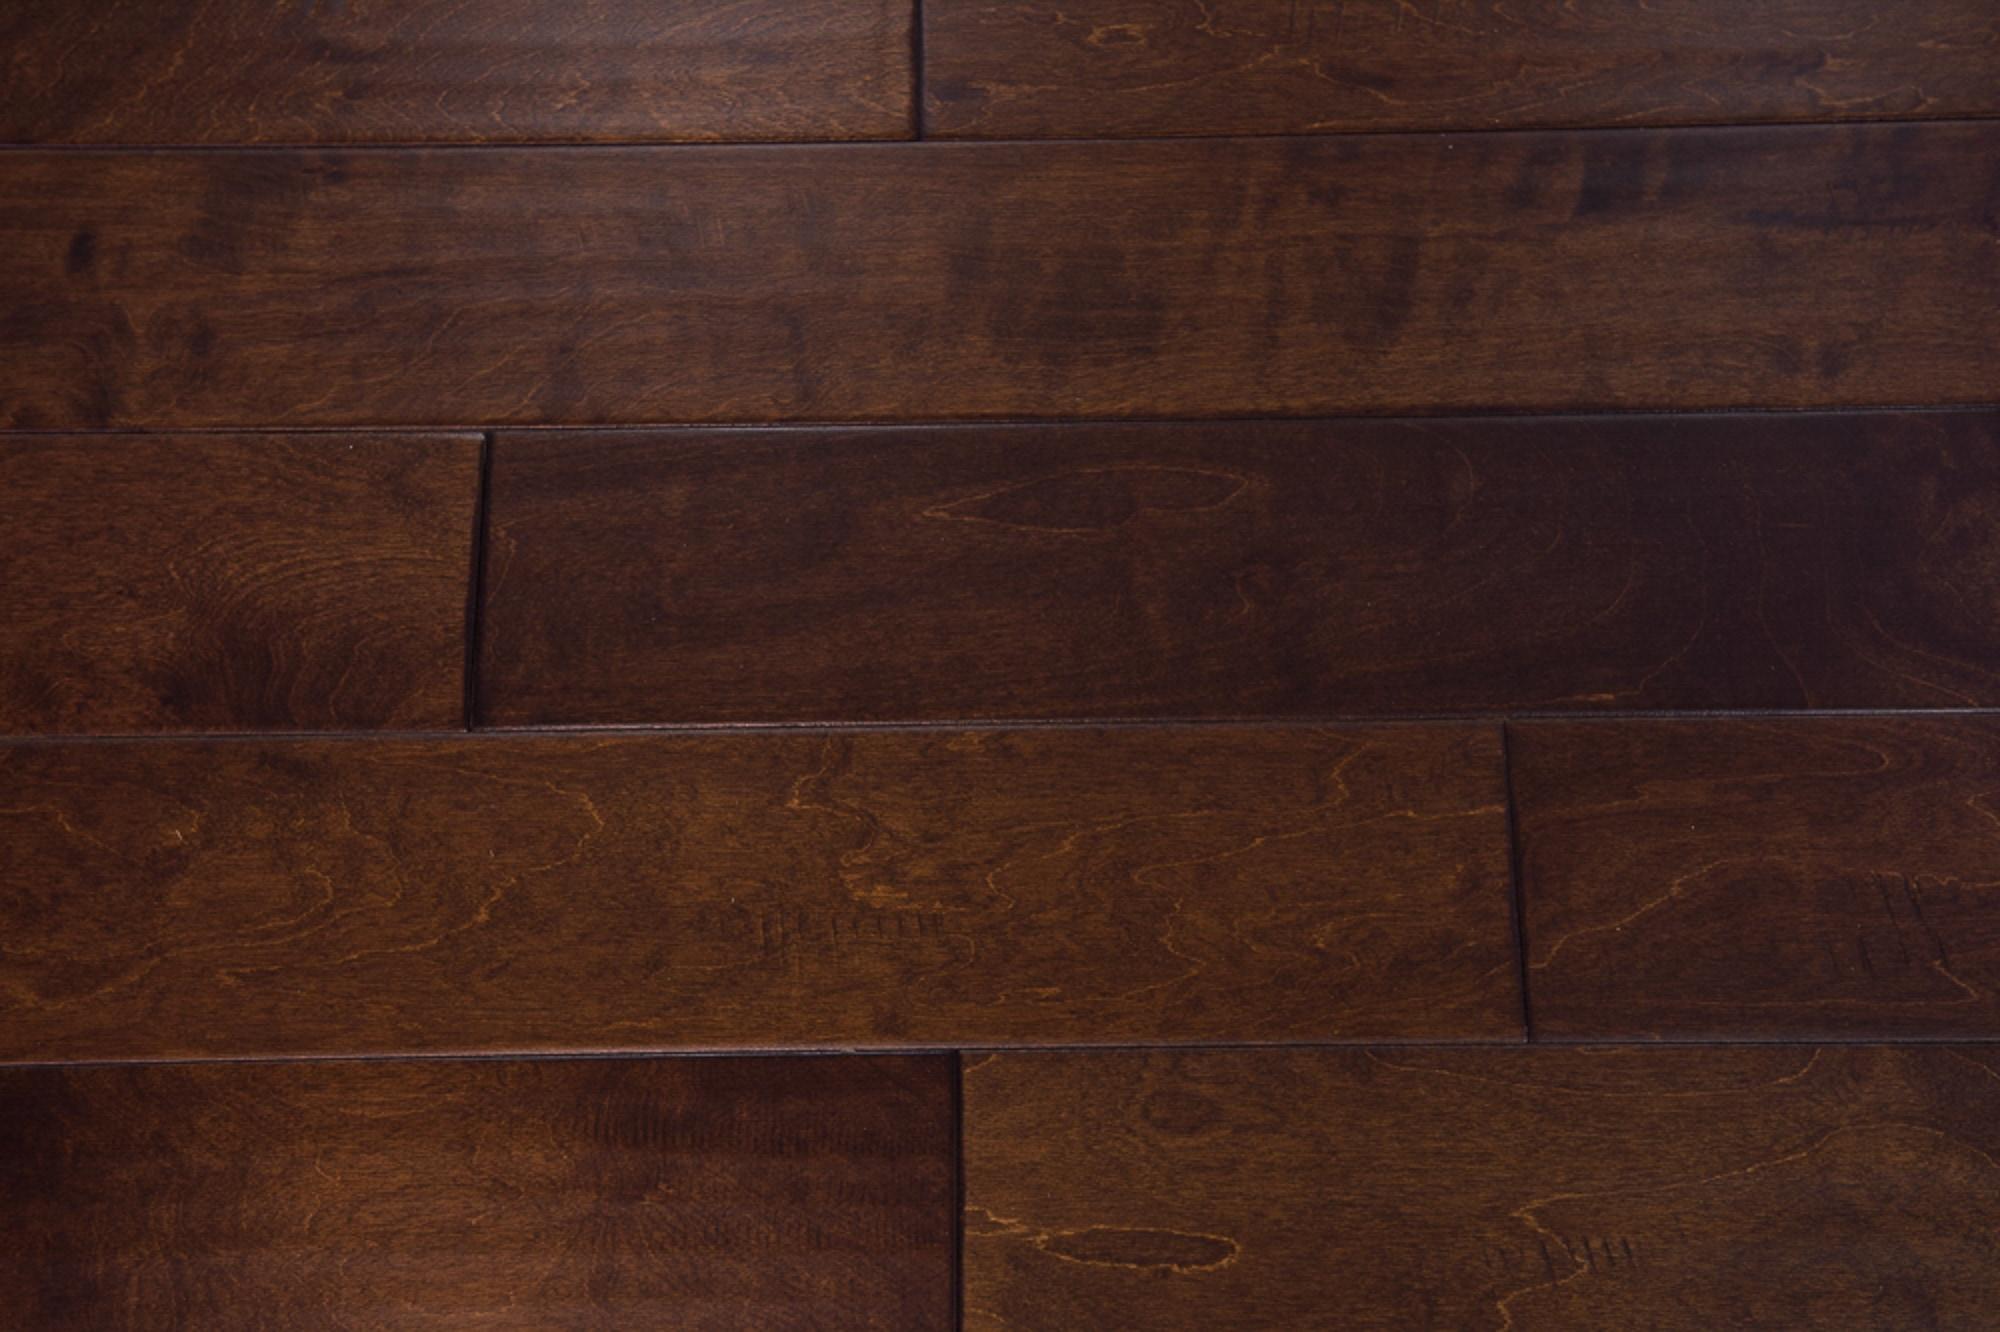 Anise / Baltic Birch / Urethane / ABC / Sample Engineered Hardwood - Baltic Birch - Bonaventure Collection 0